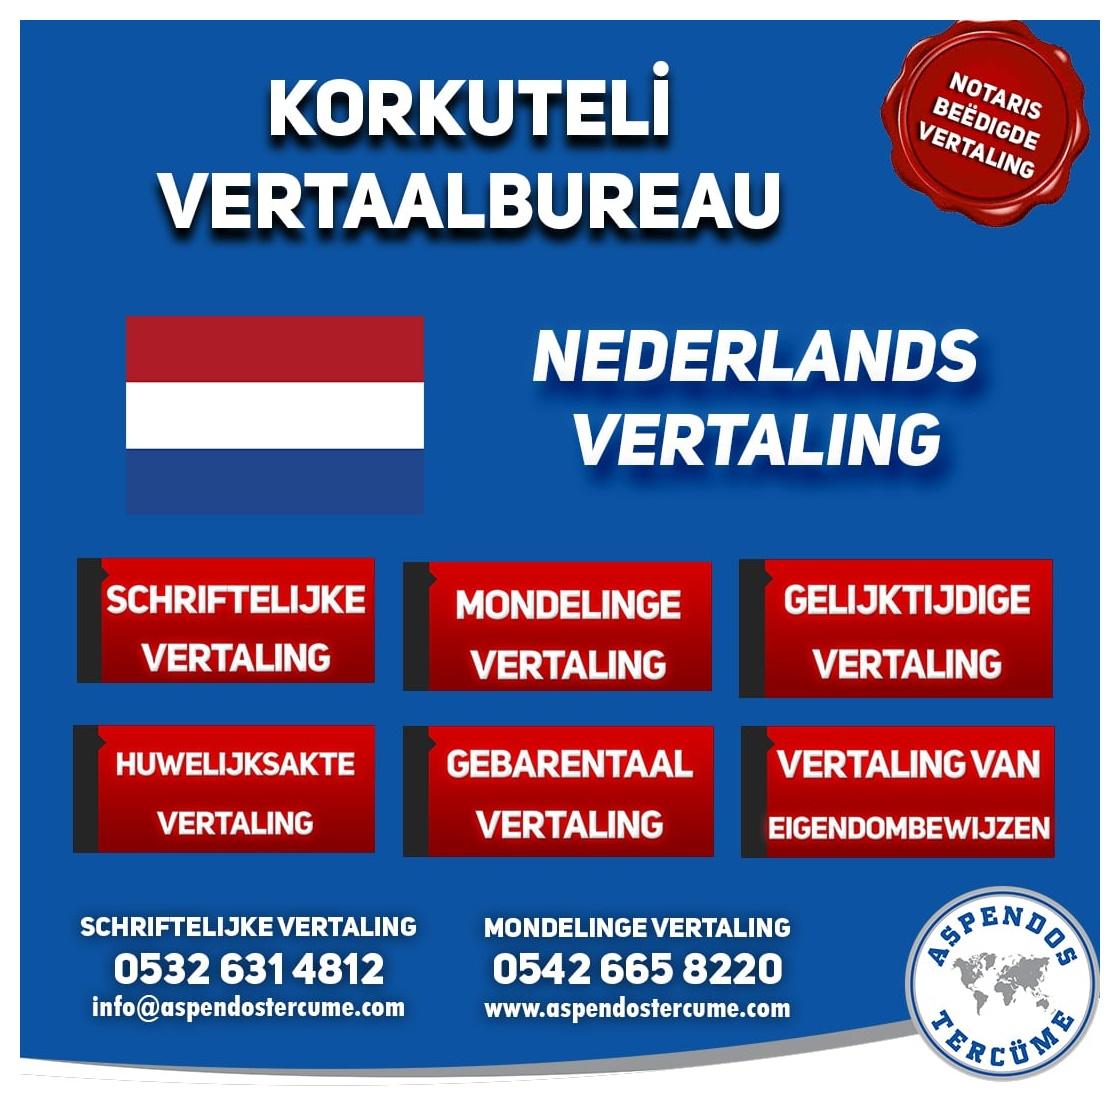 korkuteli_vertaalbureau nederlandse vertaling_NL